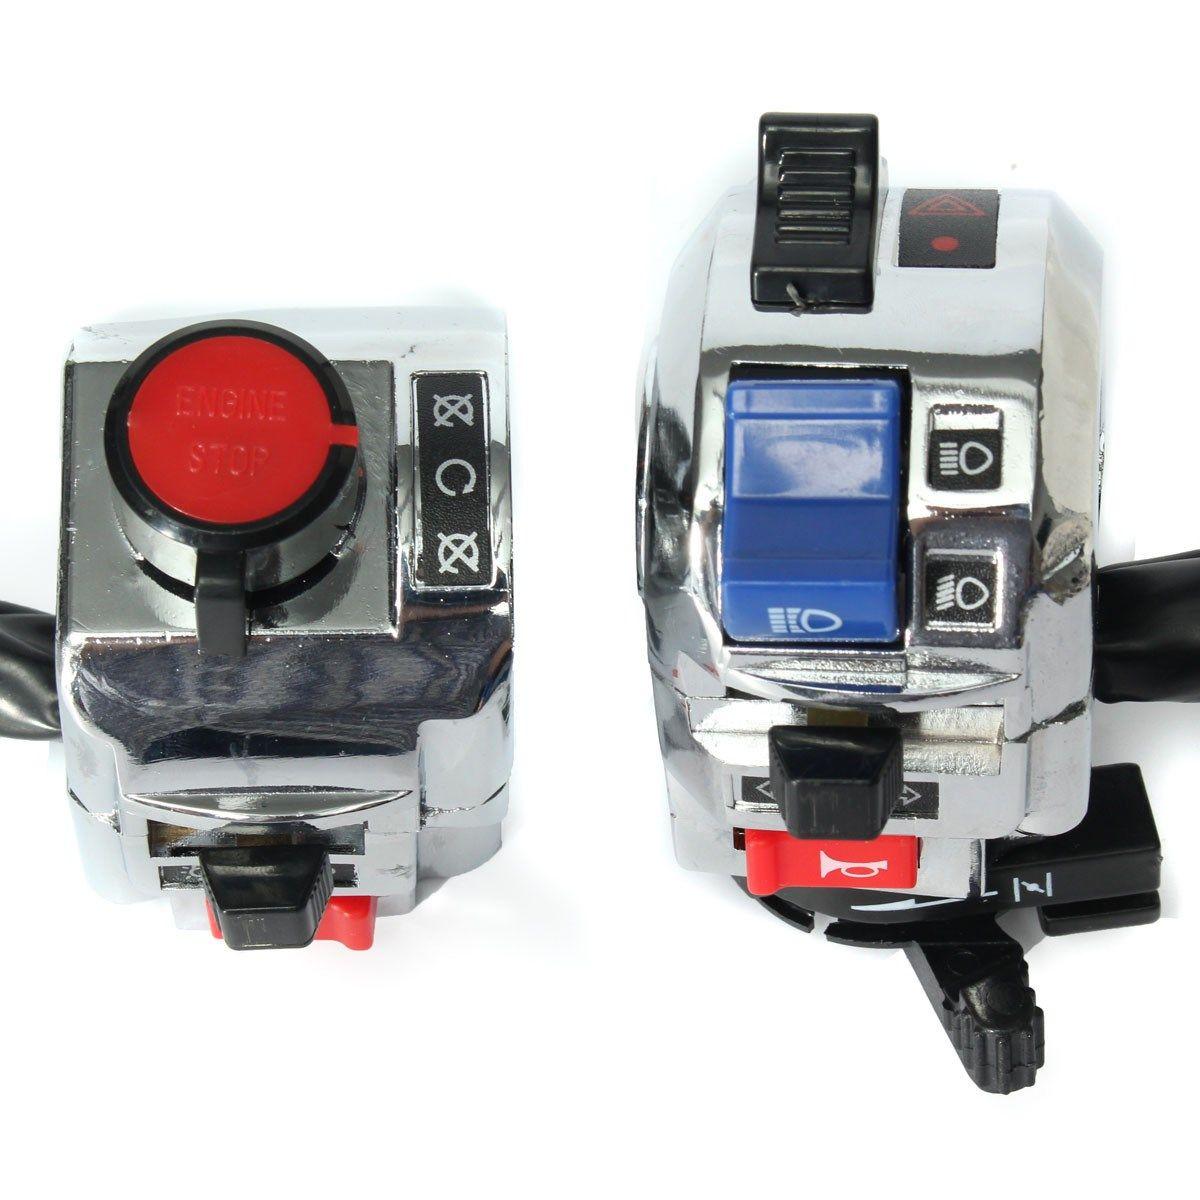 1 Pair Aluminum Motorcycle 7/8 Inch Handlebar Control Horn Turn Signal Light Start Switch For Honda